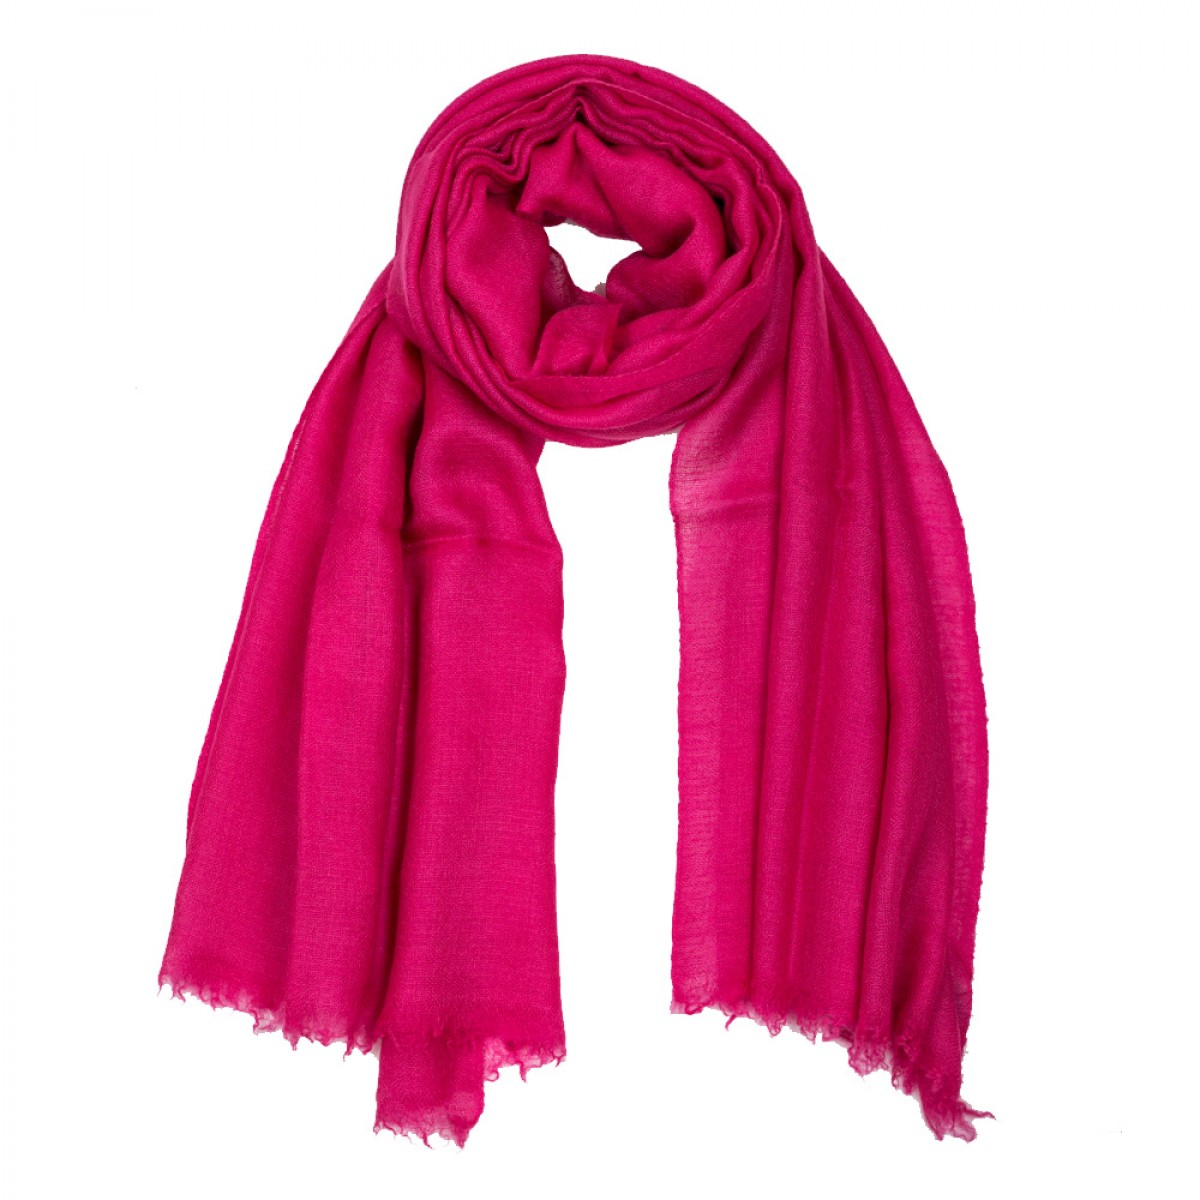 Plain Pashmina Stole - Hot Pink